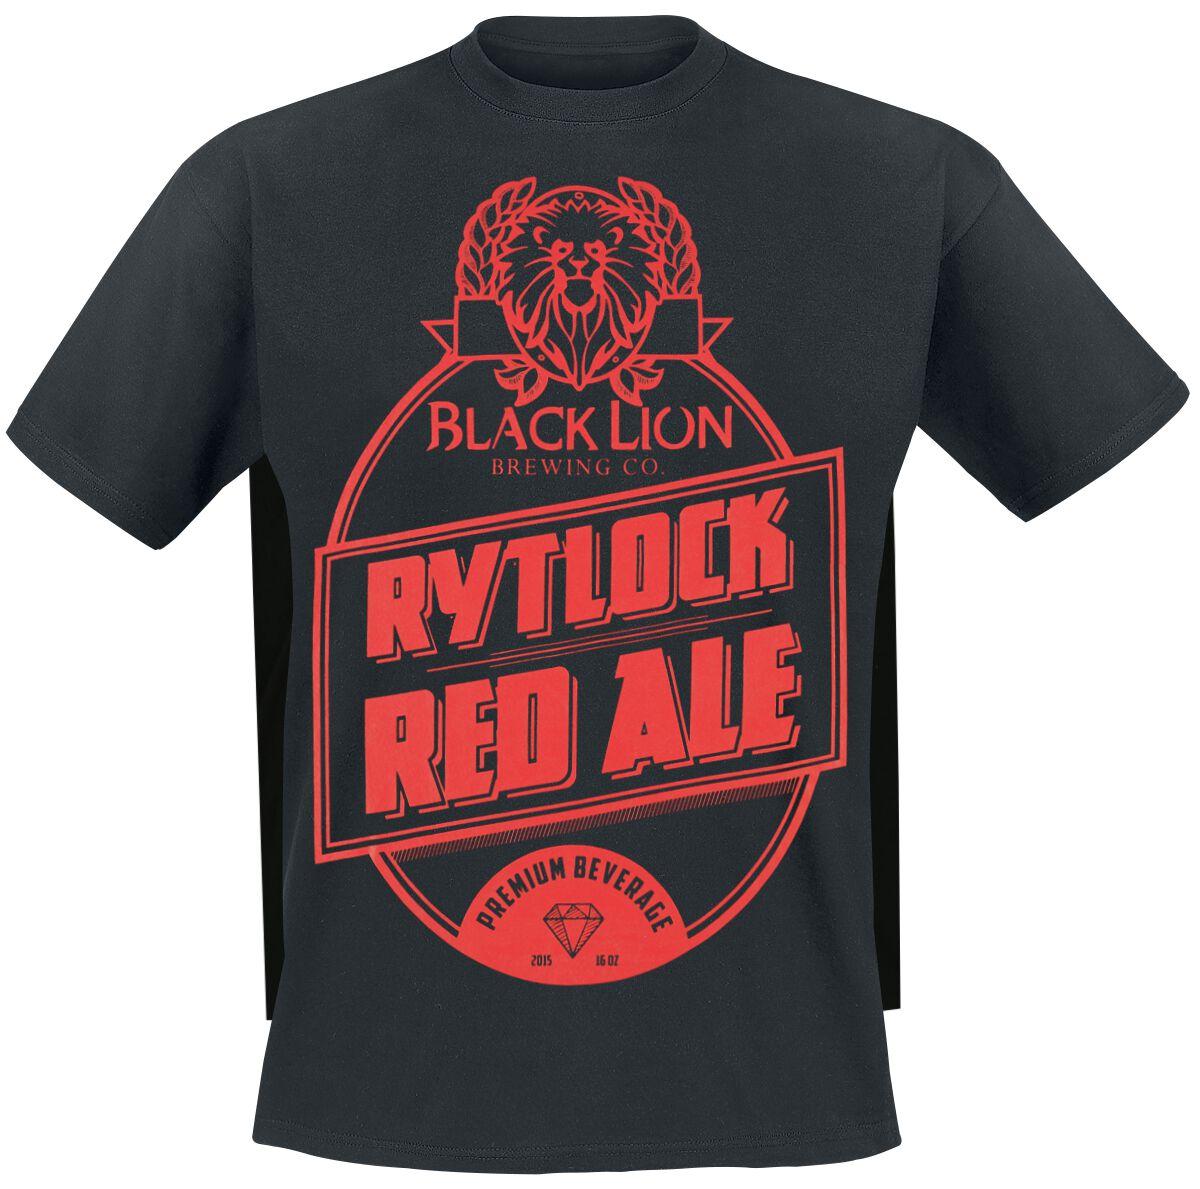 Guild Wars 2 - Rytlock Red Ale T-Shirt schwarz M444229 - B&C #E150